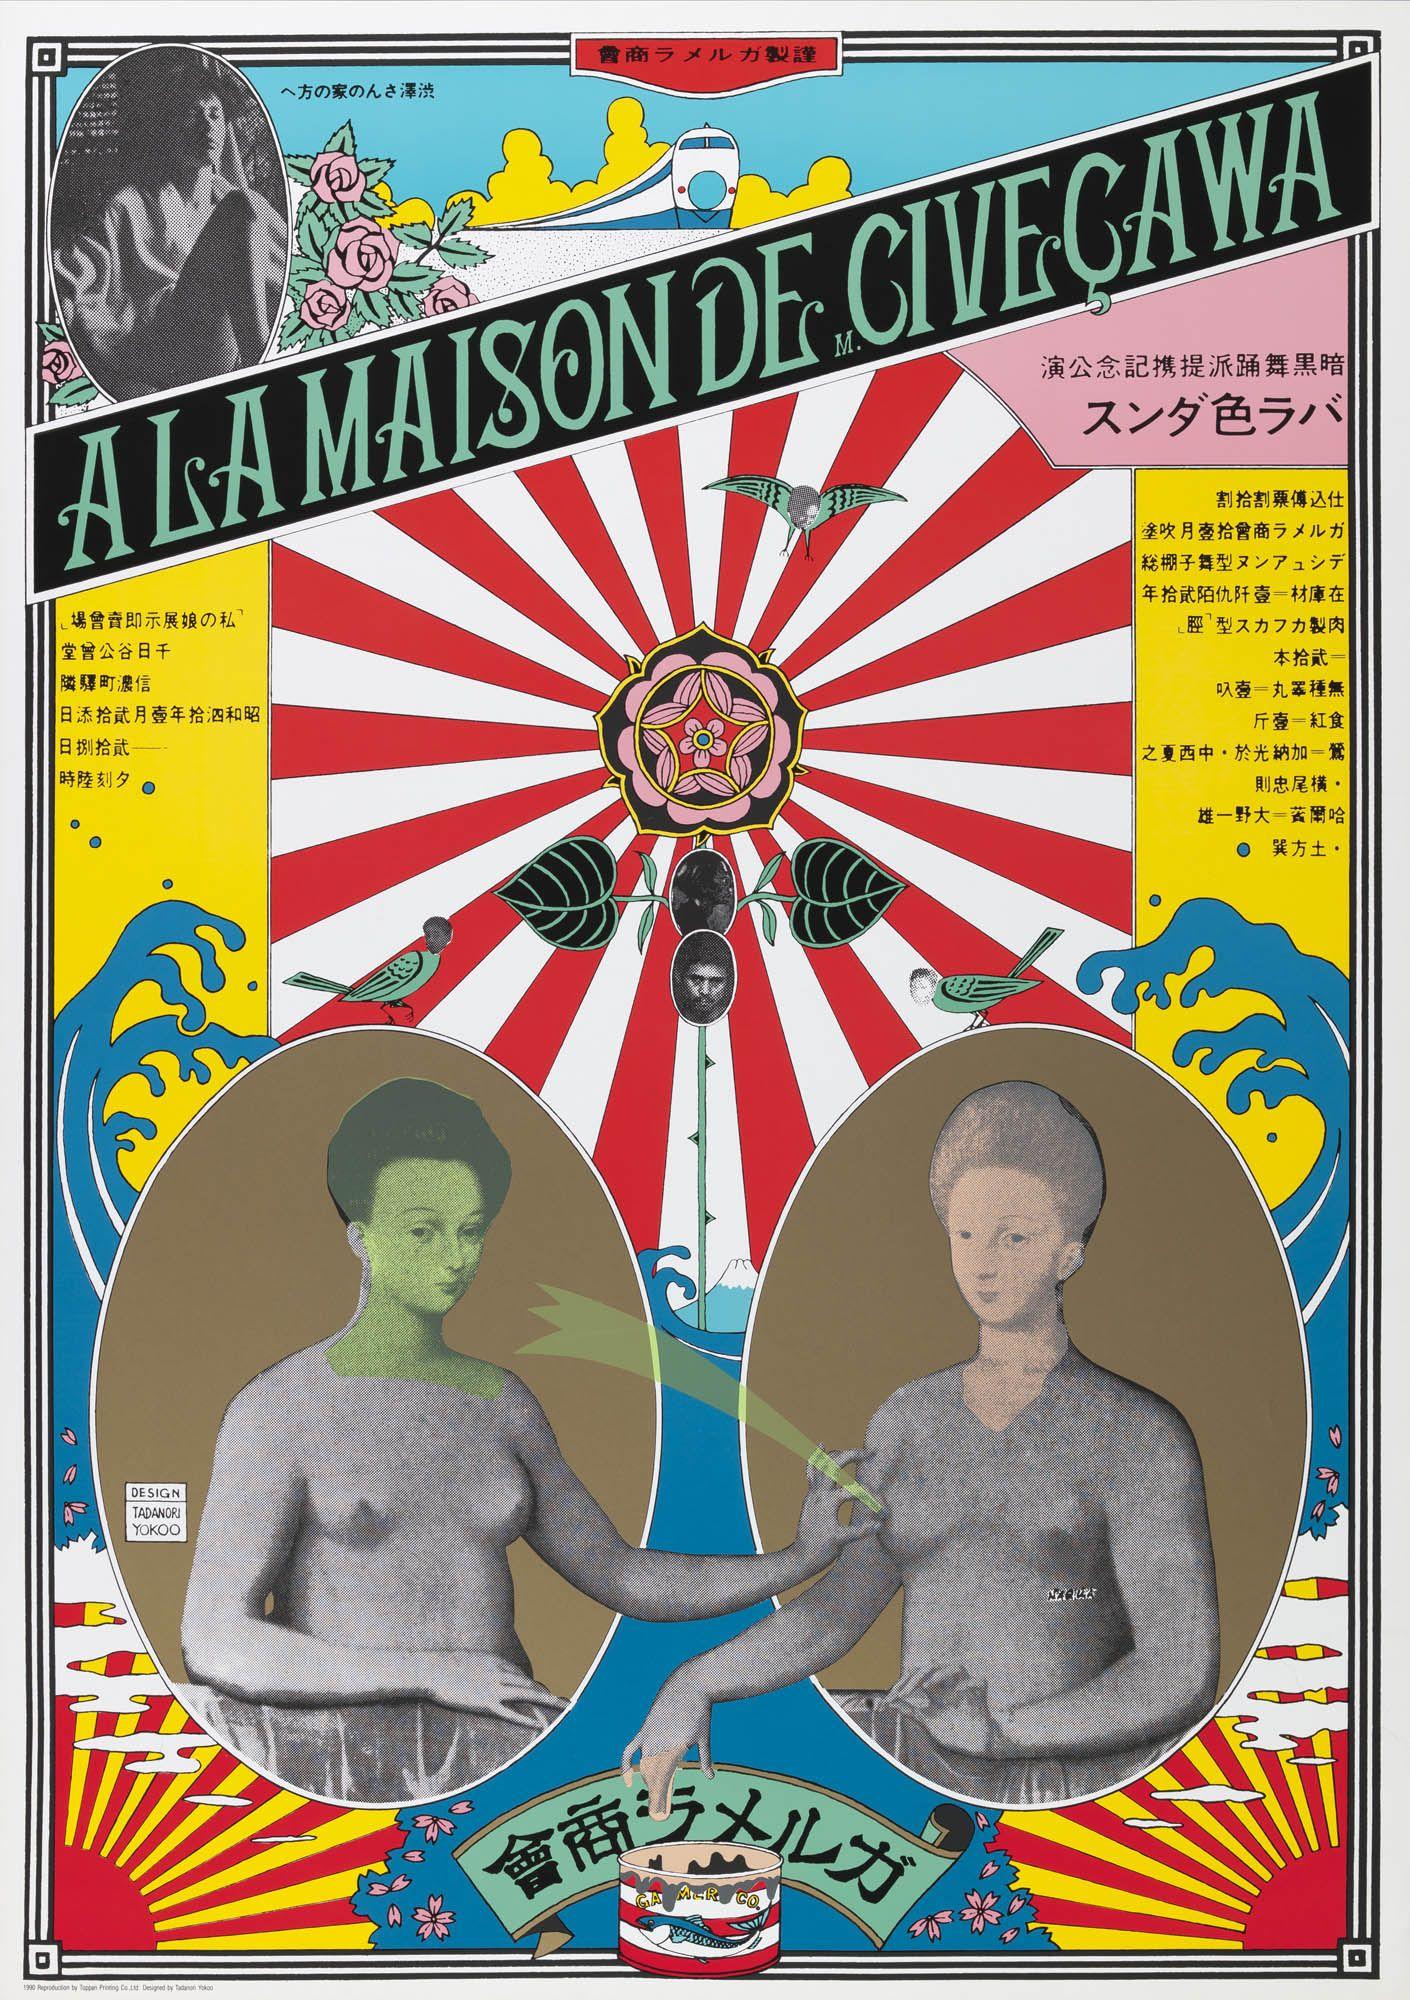 Tadanori Yokoo A Climax at the Age of 29 Japan Kunstdruck Faks/_Plakatwelt 637